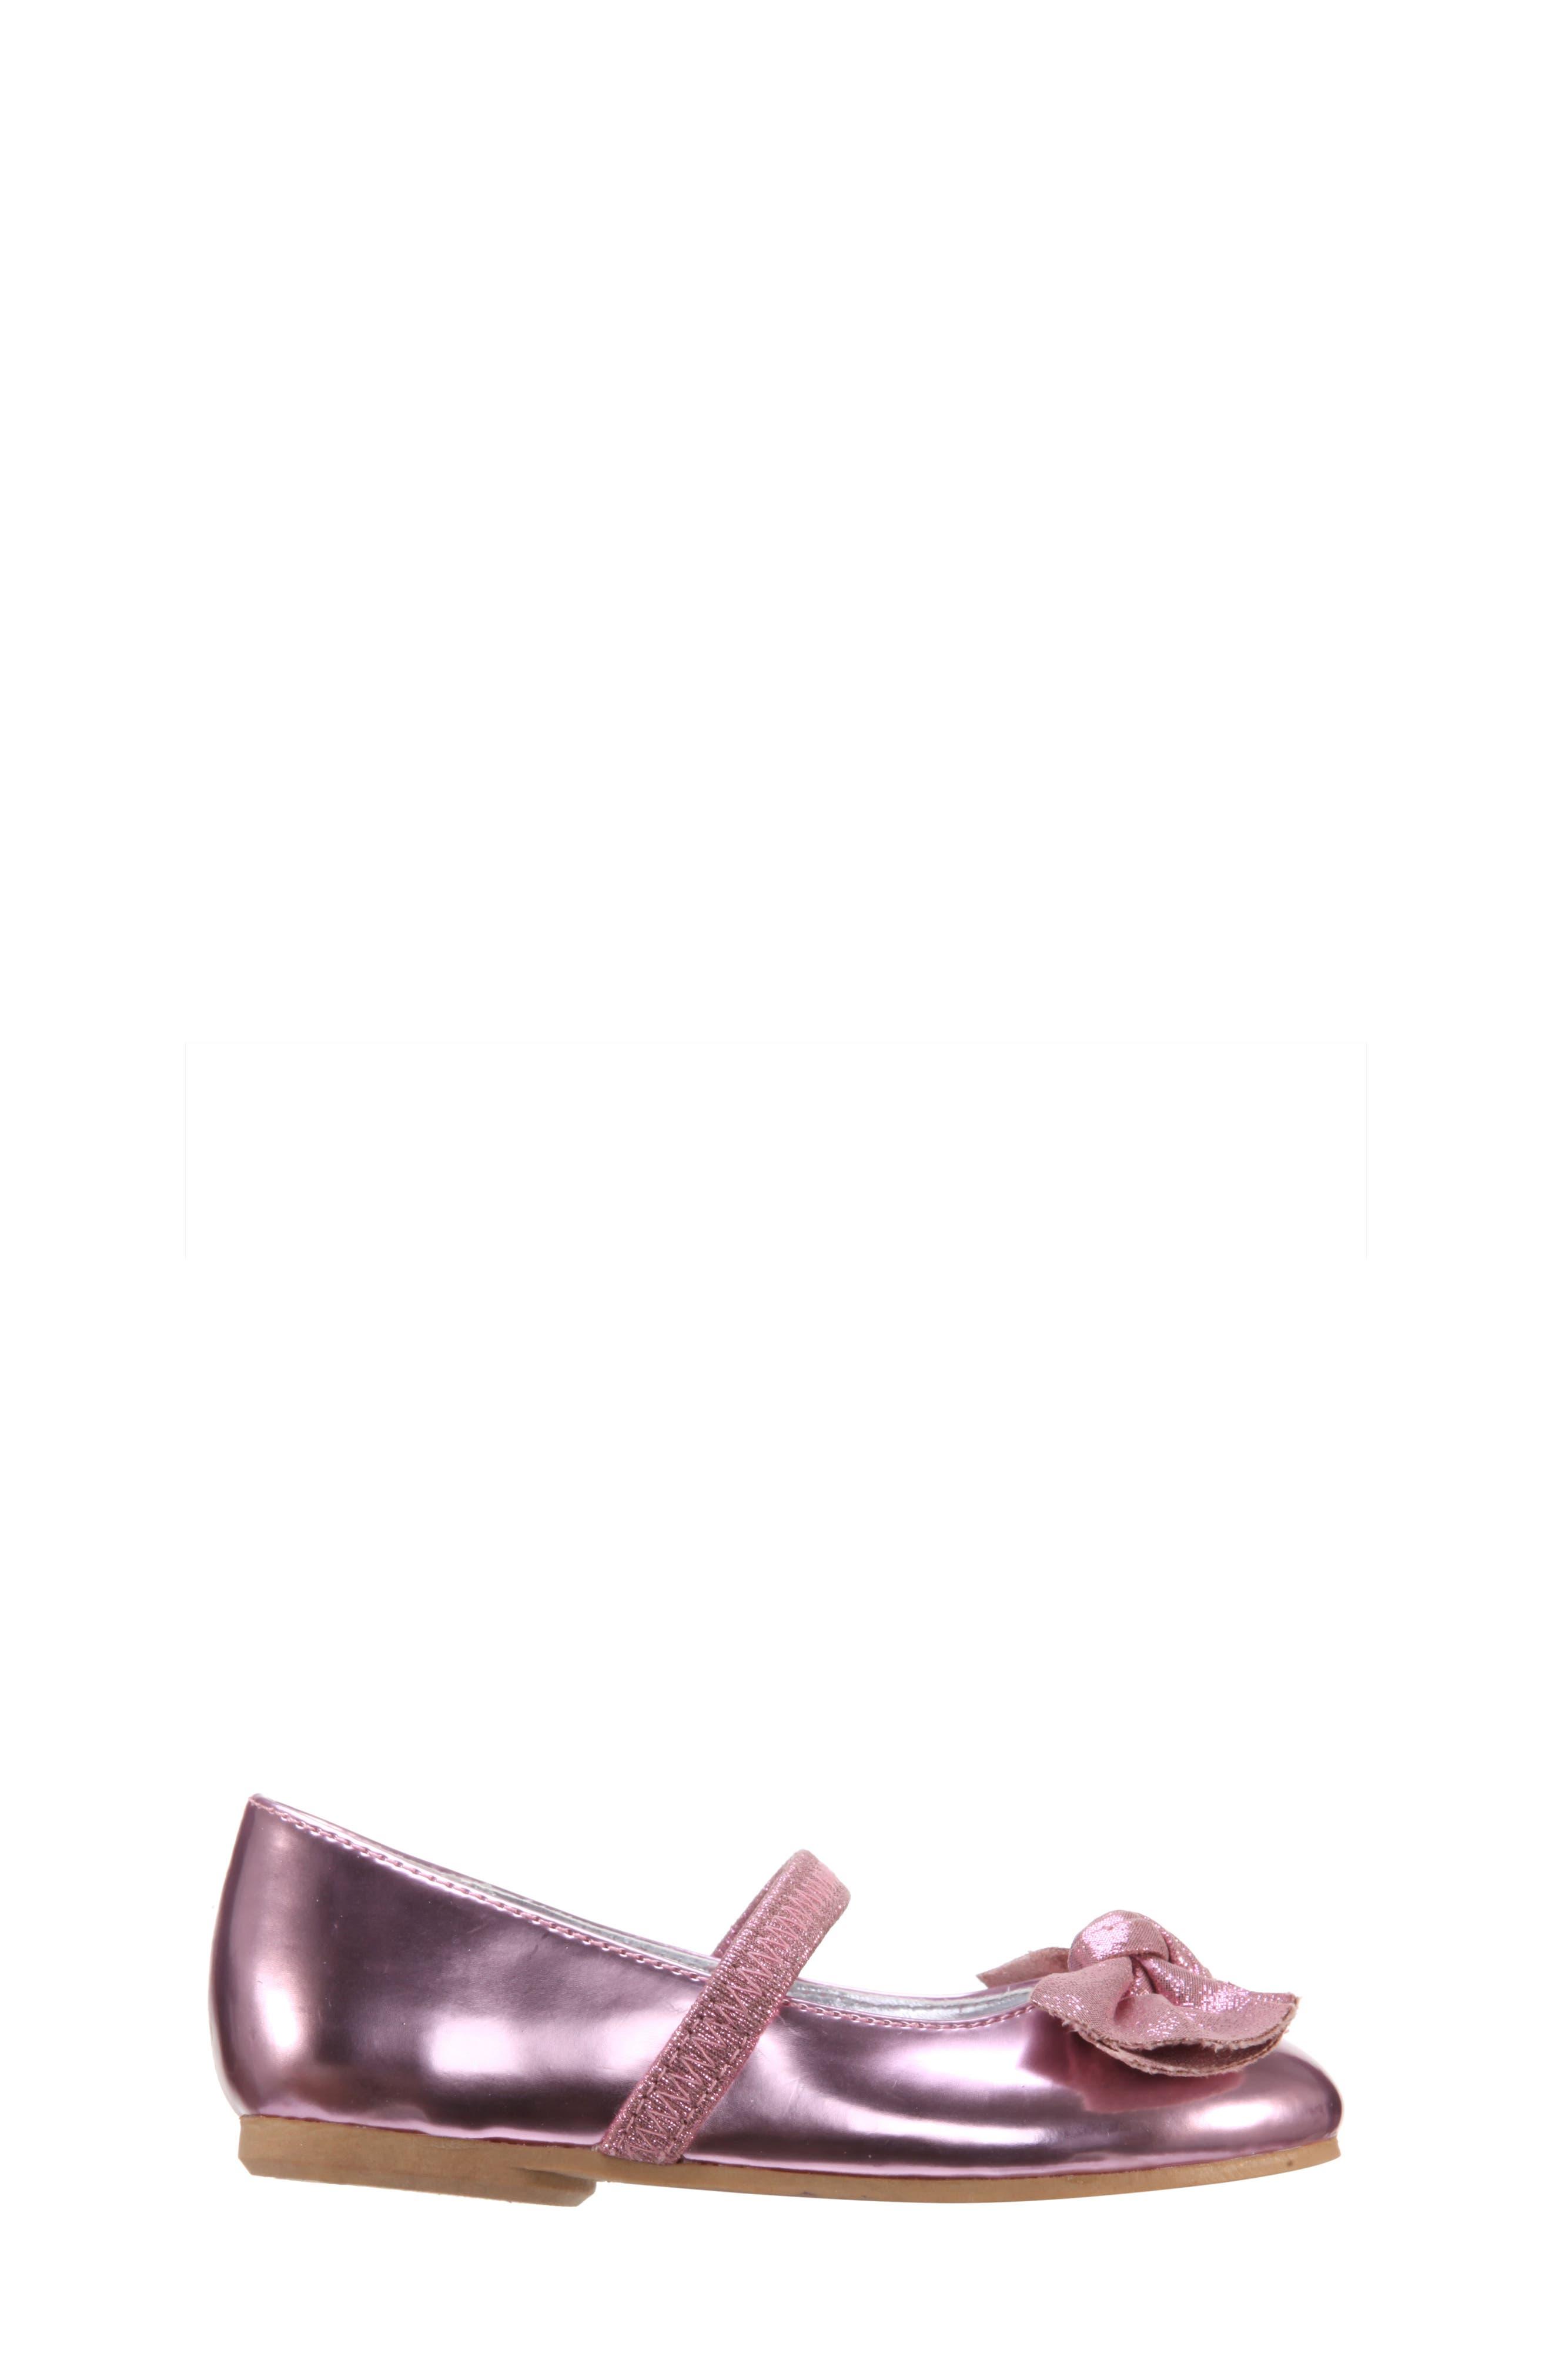 Kaytelyn-T Glitter Bow Ballet Flat,                             Alternate thumbnail 19, color,